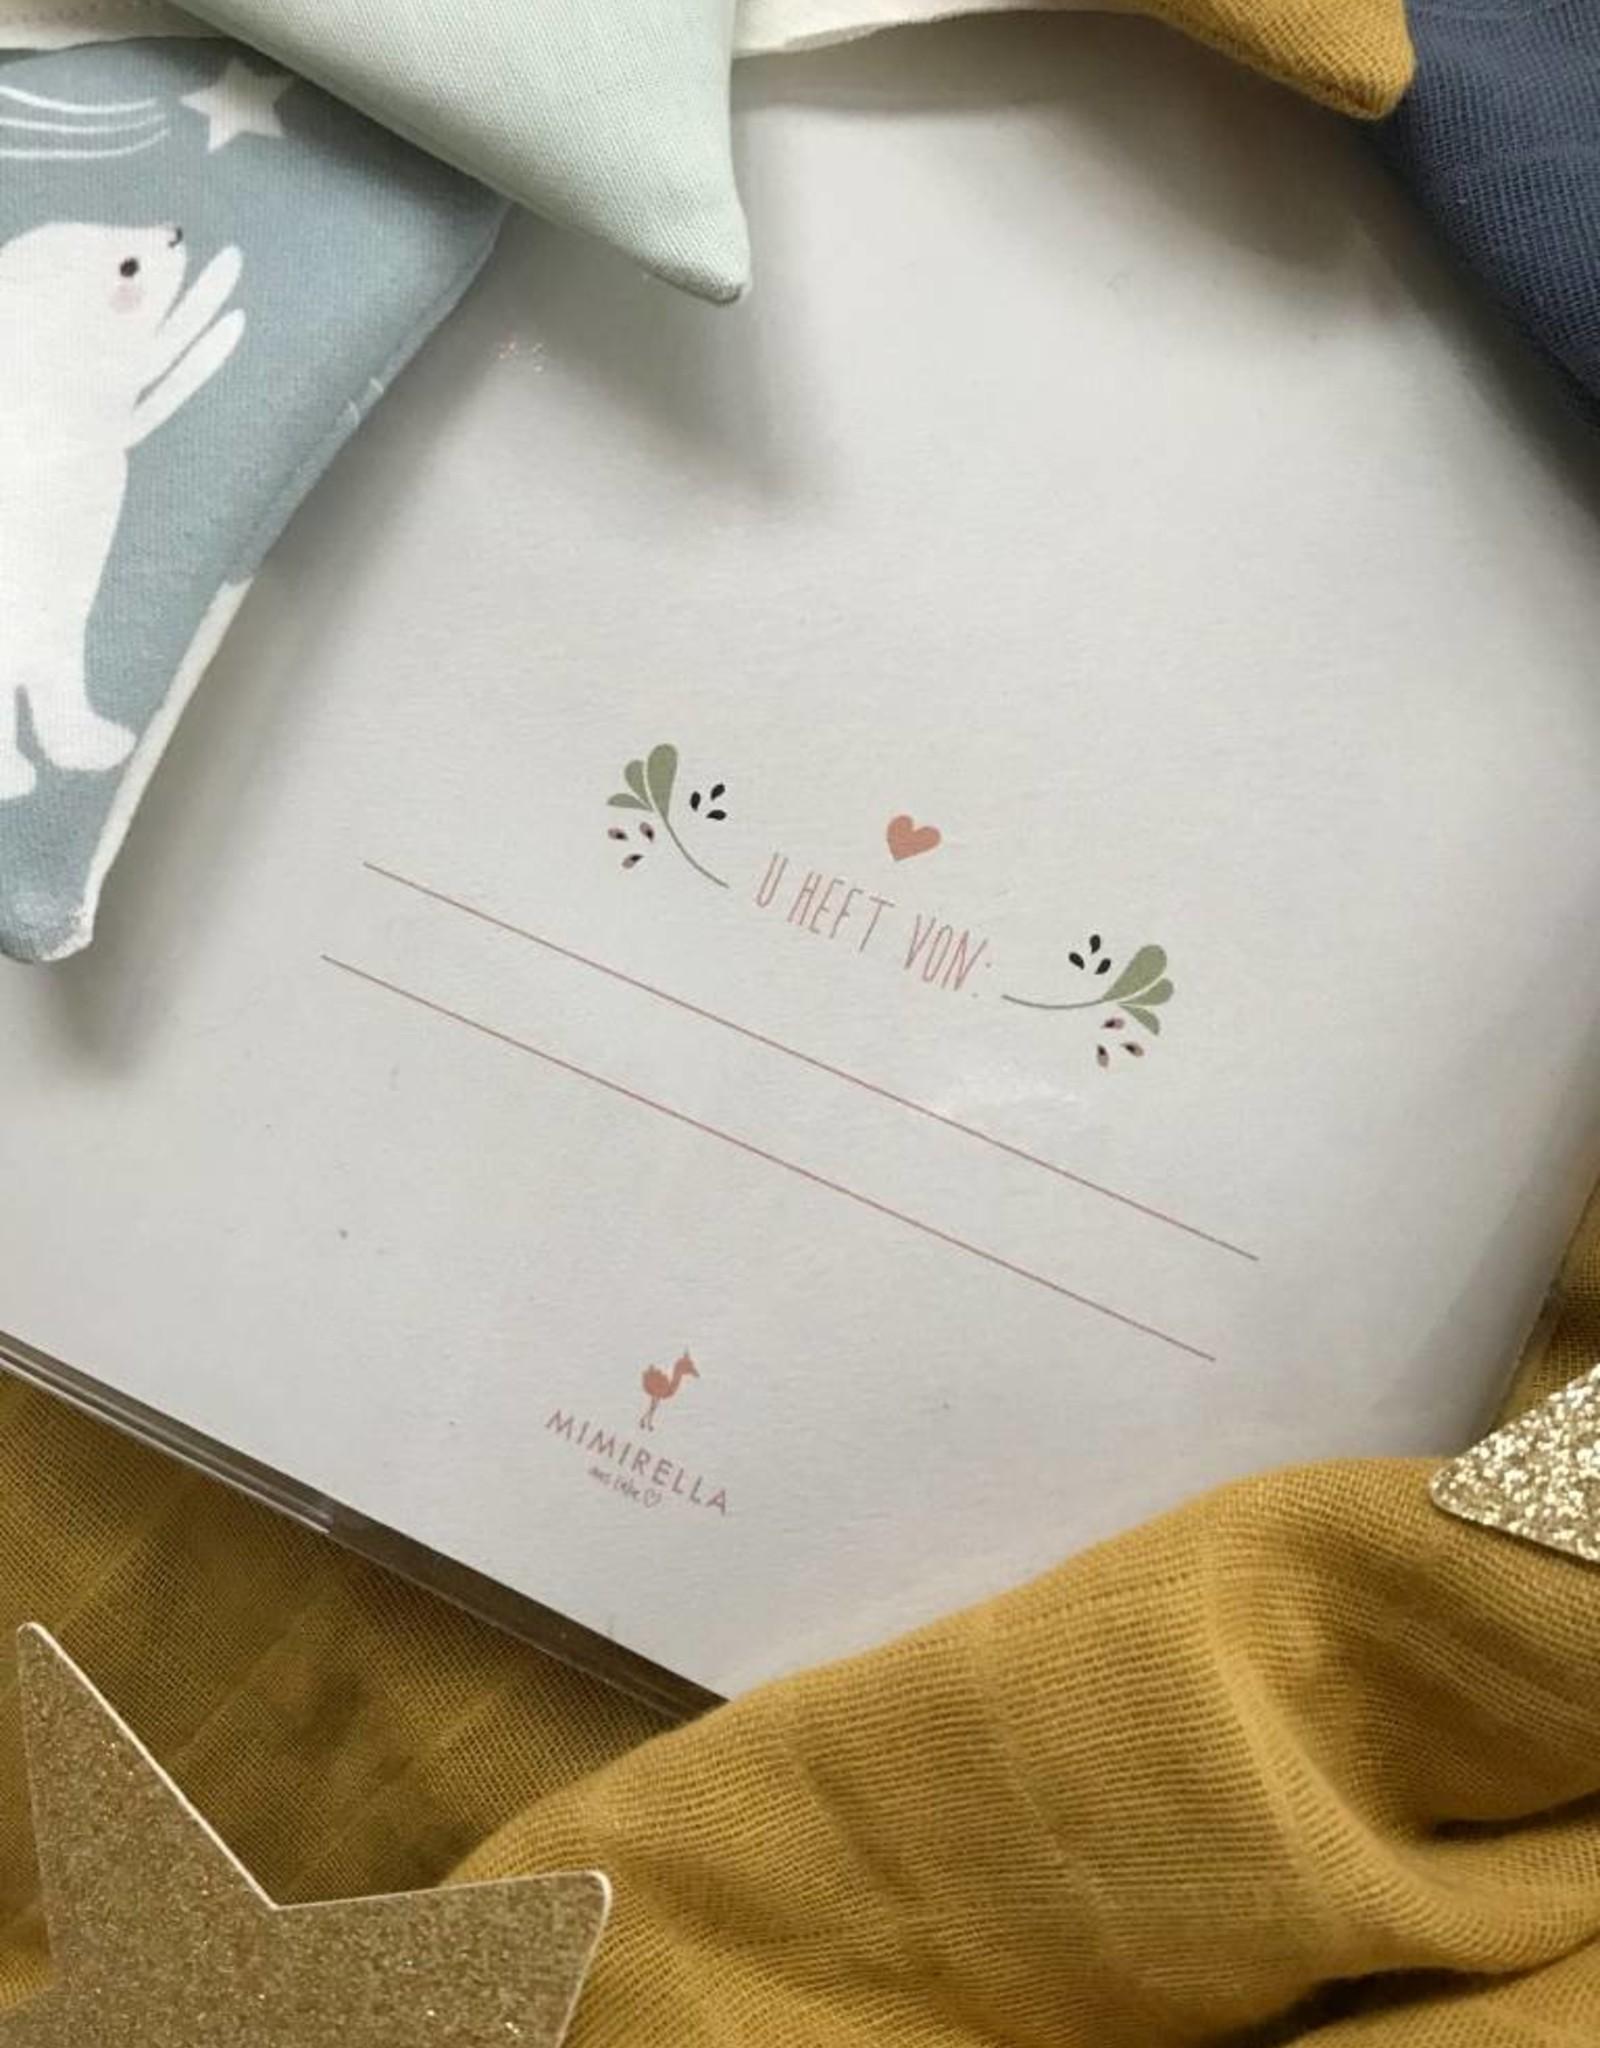 Mimirella sleeve for your child's U Heft